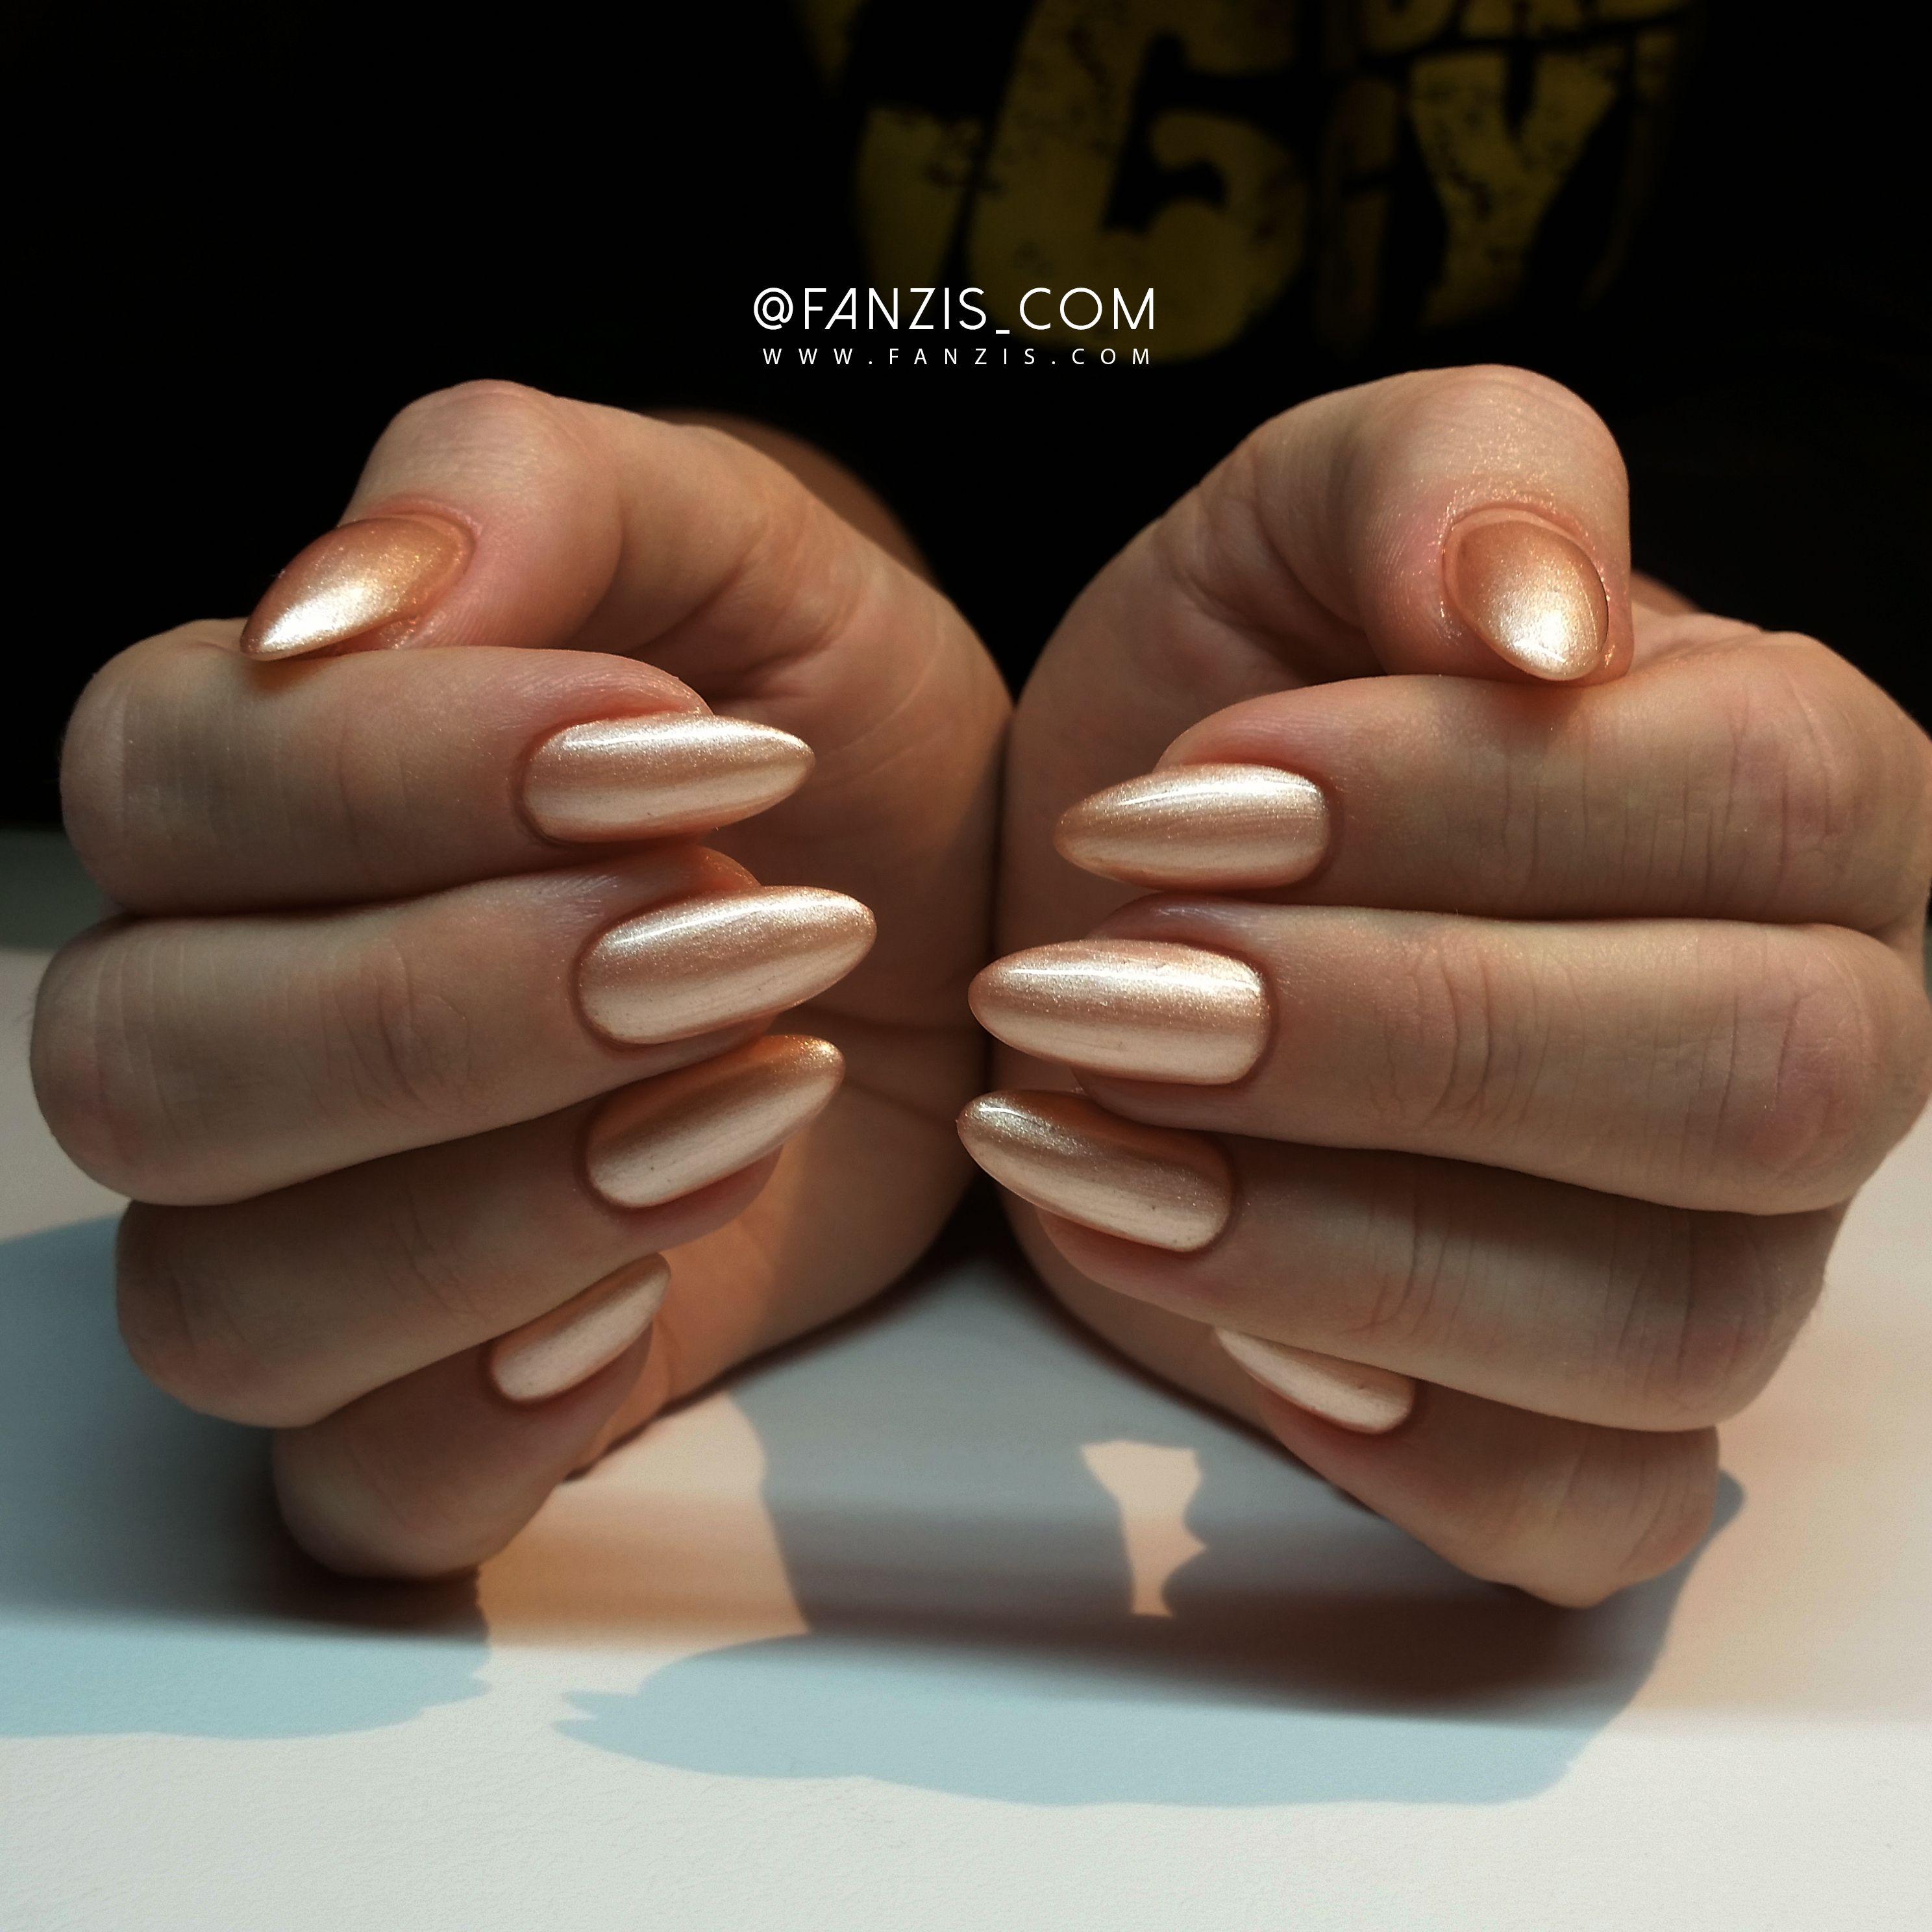 gold #golden #exclusive #elegant #luxury #glamour #nails #fanzis ...